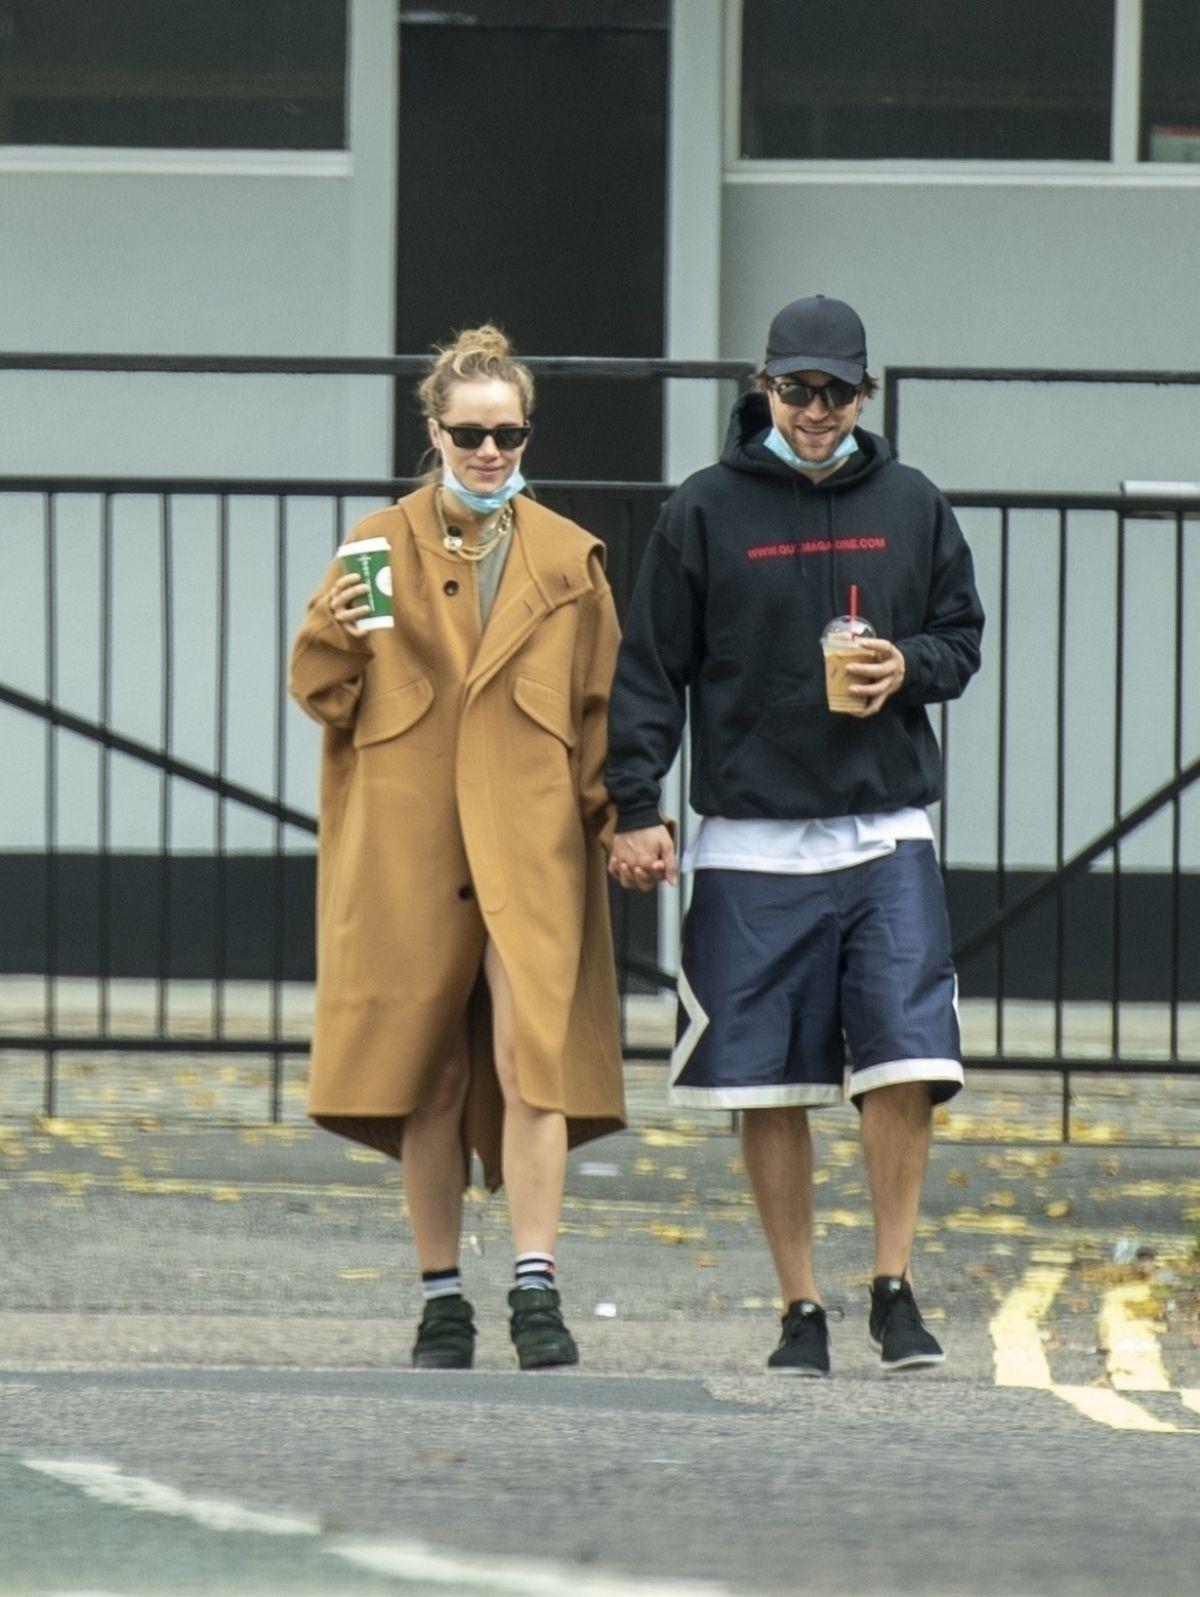 SUKI WATERHOUSE and Robert Pattinson Out in London 09/16 ...